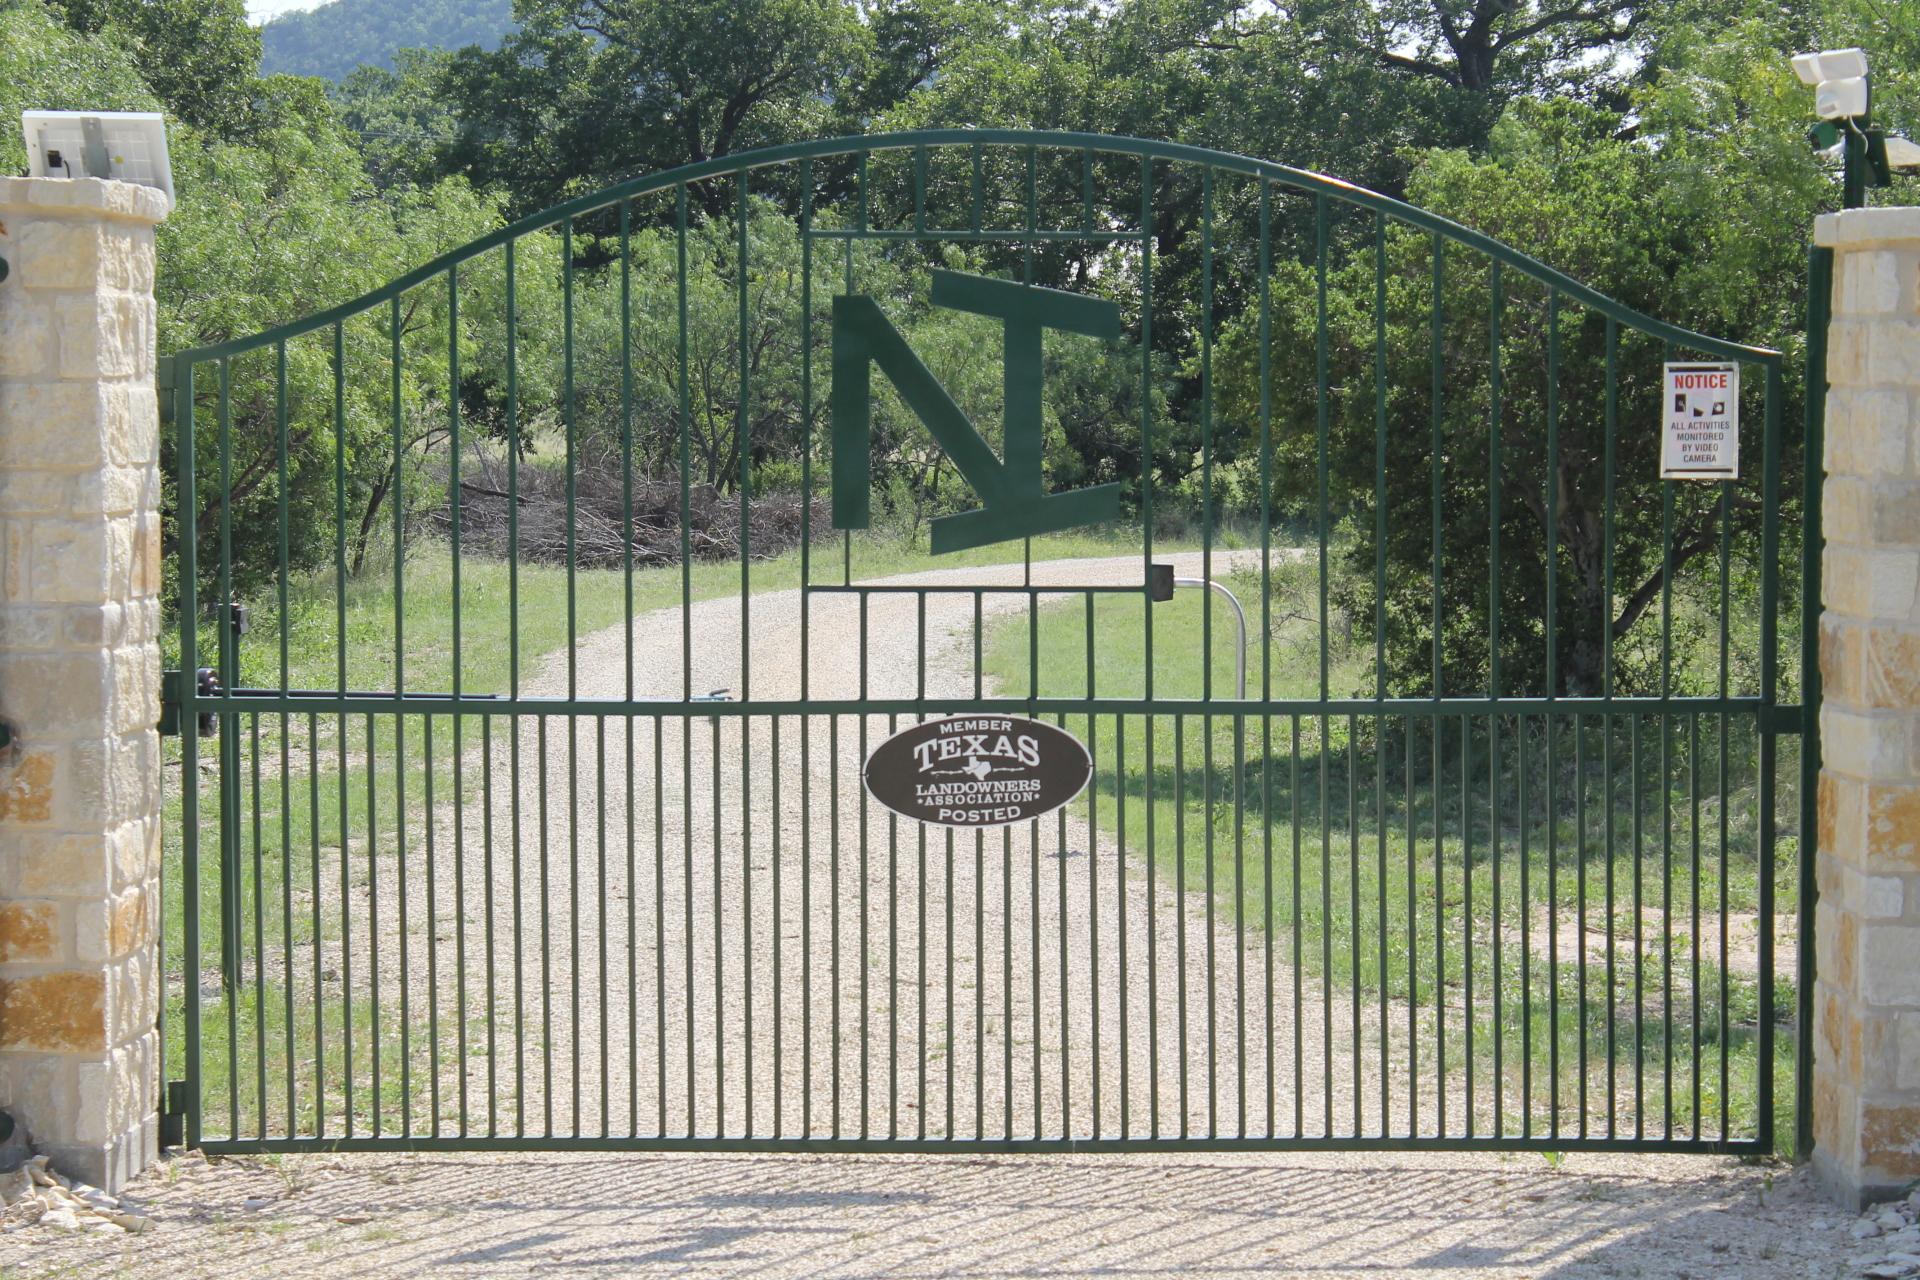 Custom gate with Alamo arch